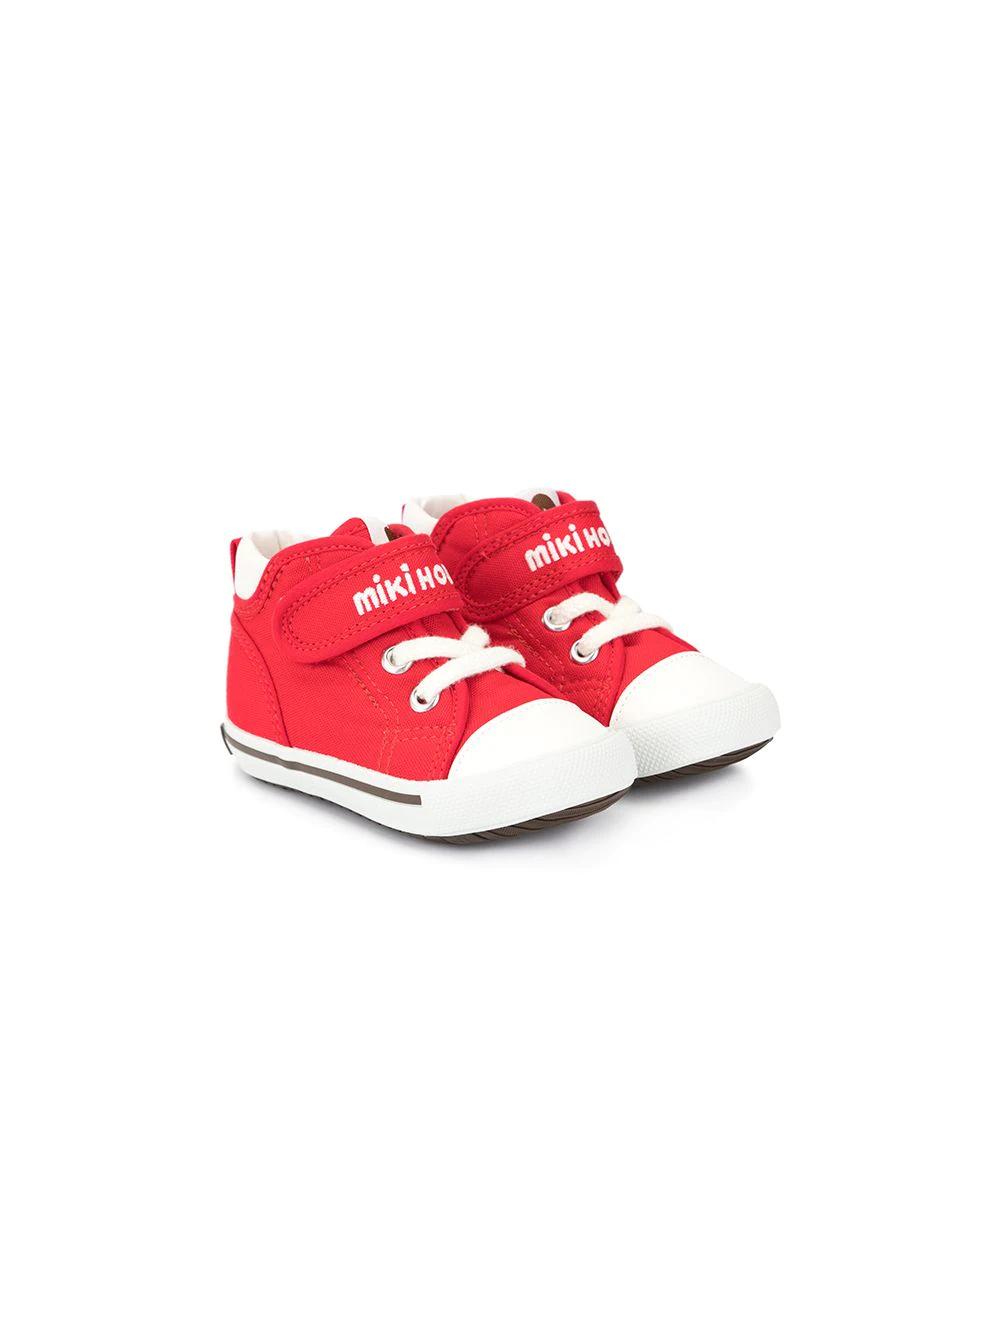 Miki House | Miki House кроссовки на липучке с логотипом | Clouty